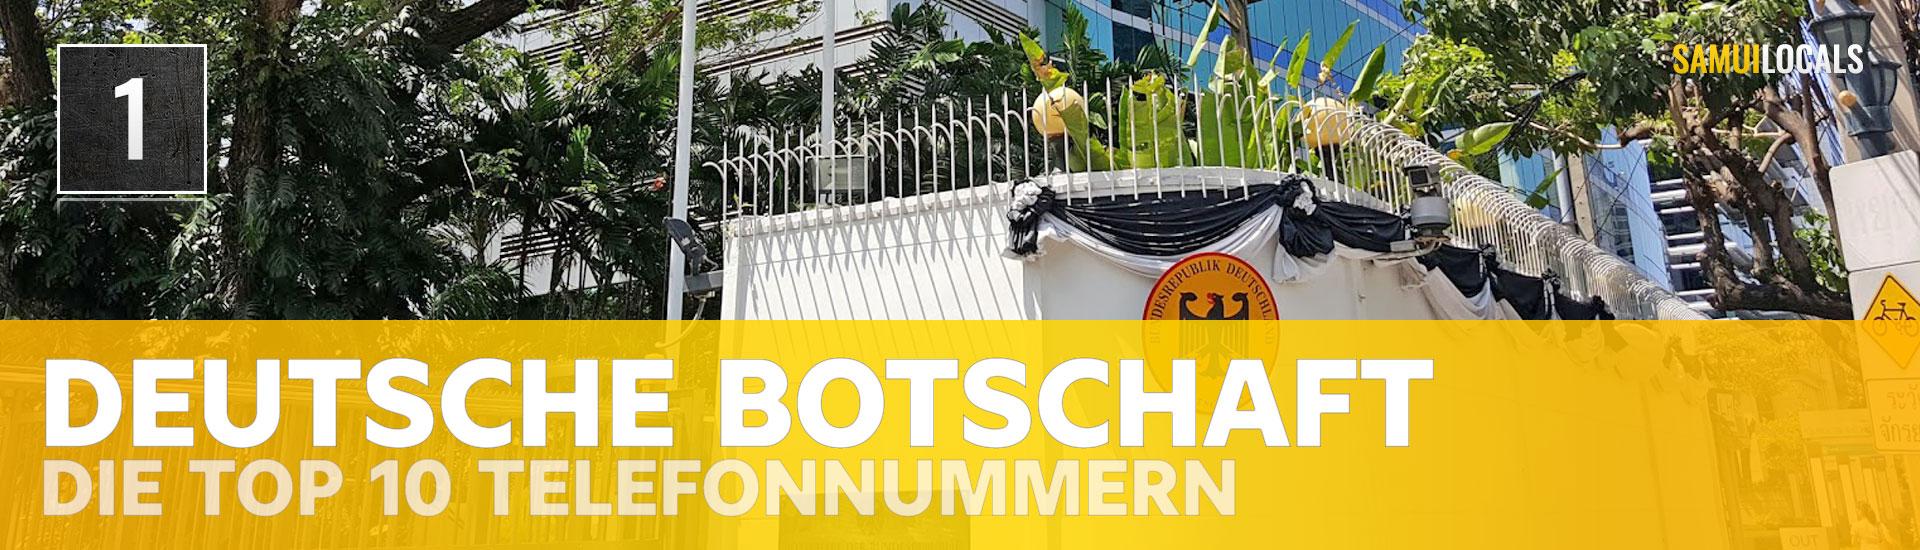 koh_samui_top_10_deutsche_botschaft